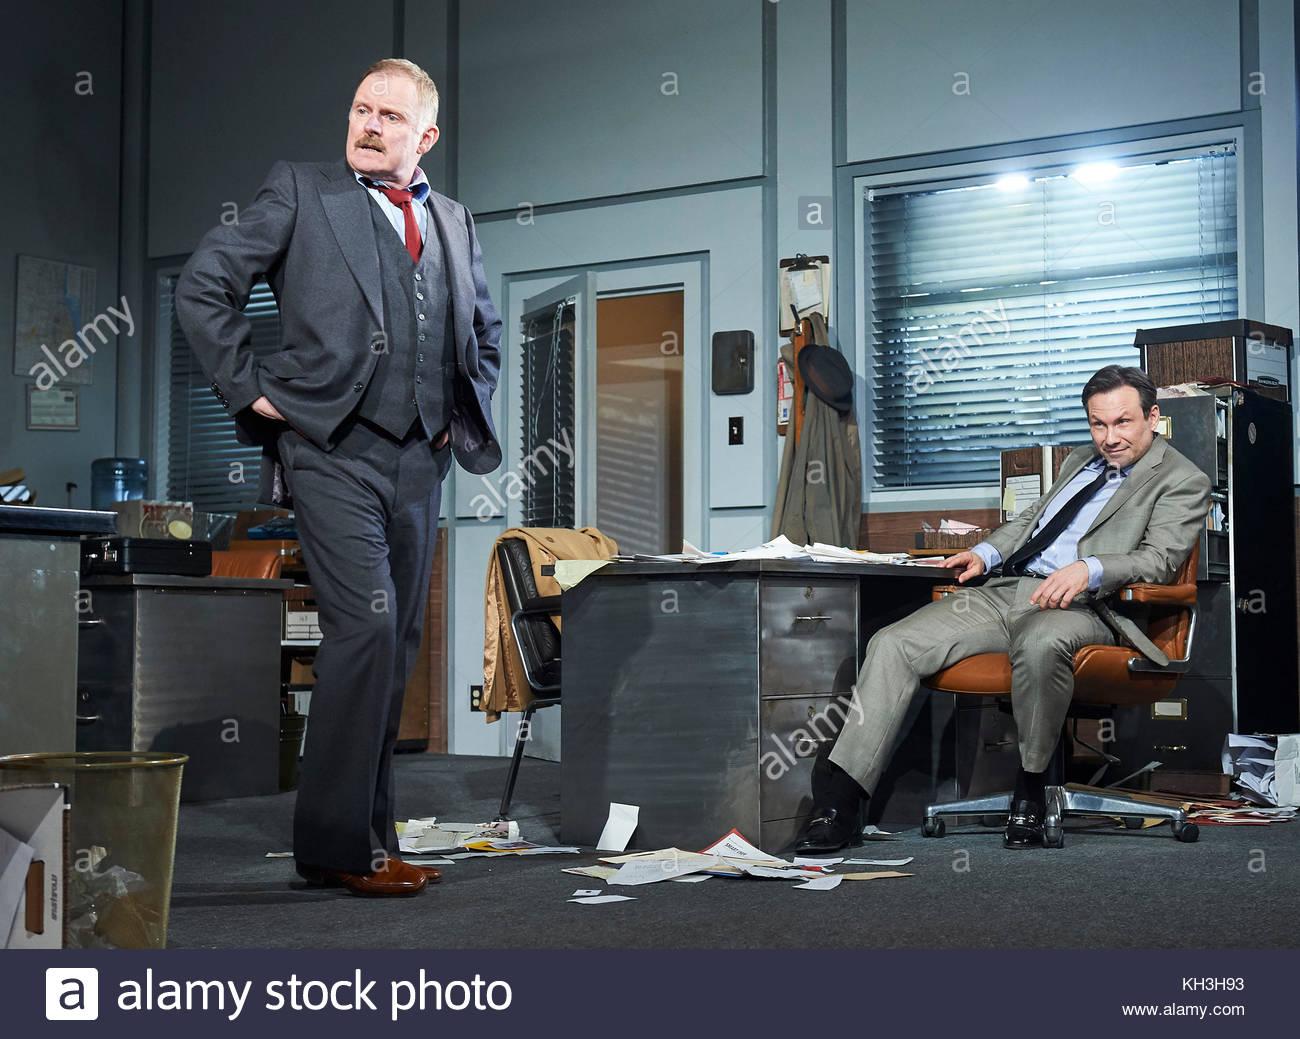 Glengarry Glen Ross by David Mamet, directed by Sam Yates. With Robert Glenister as Dave Moss, Christian Slater - Stock Image